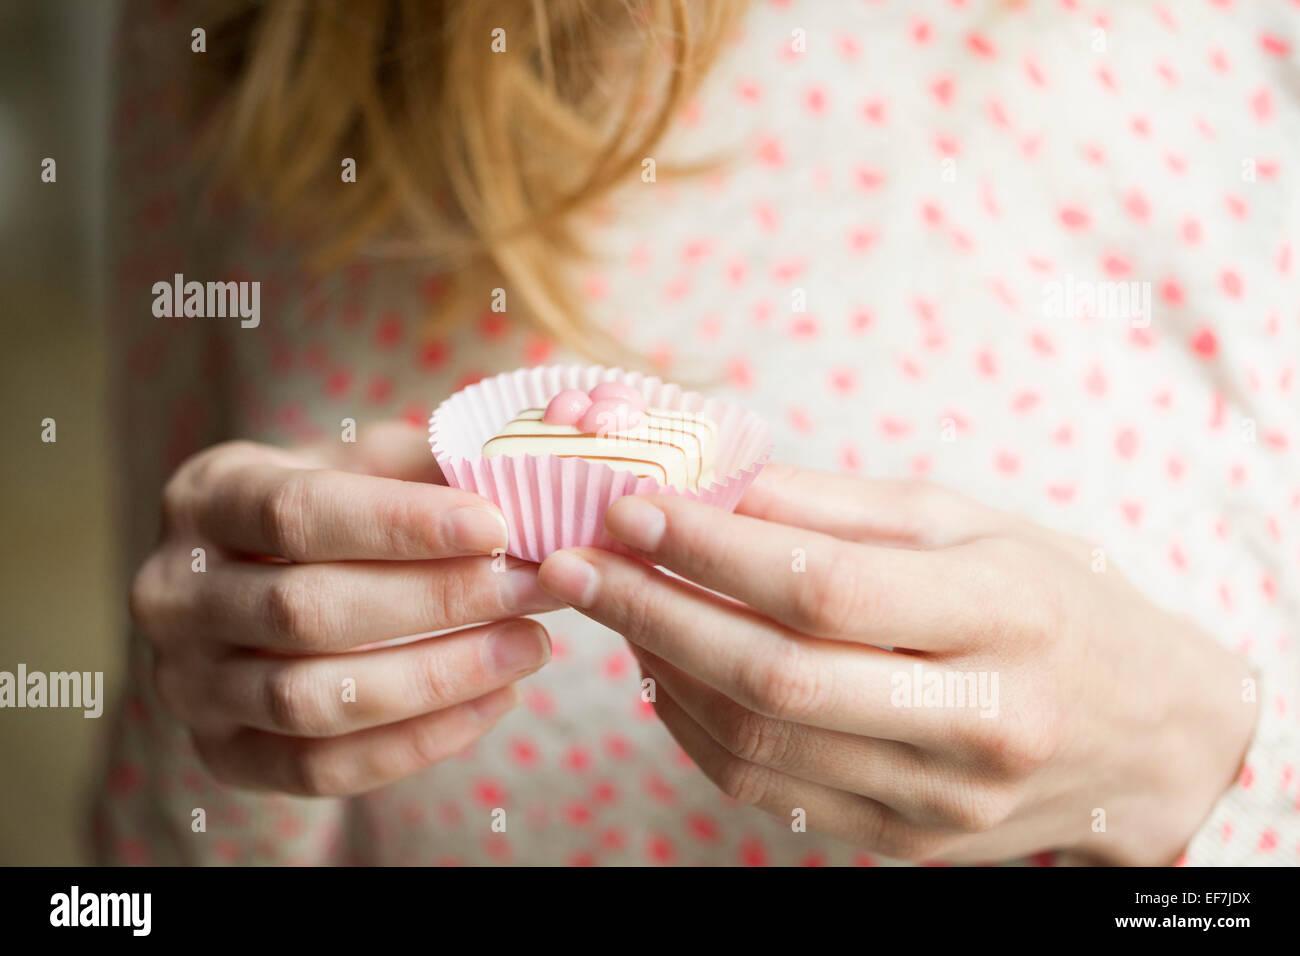 Woman eating a cupcake - Stock Image